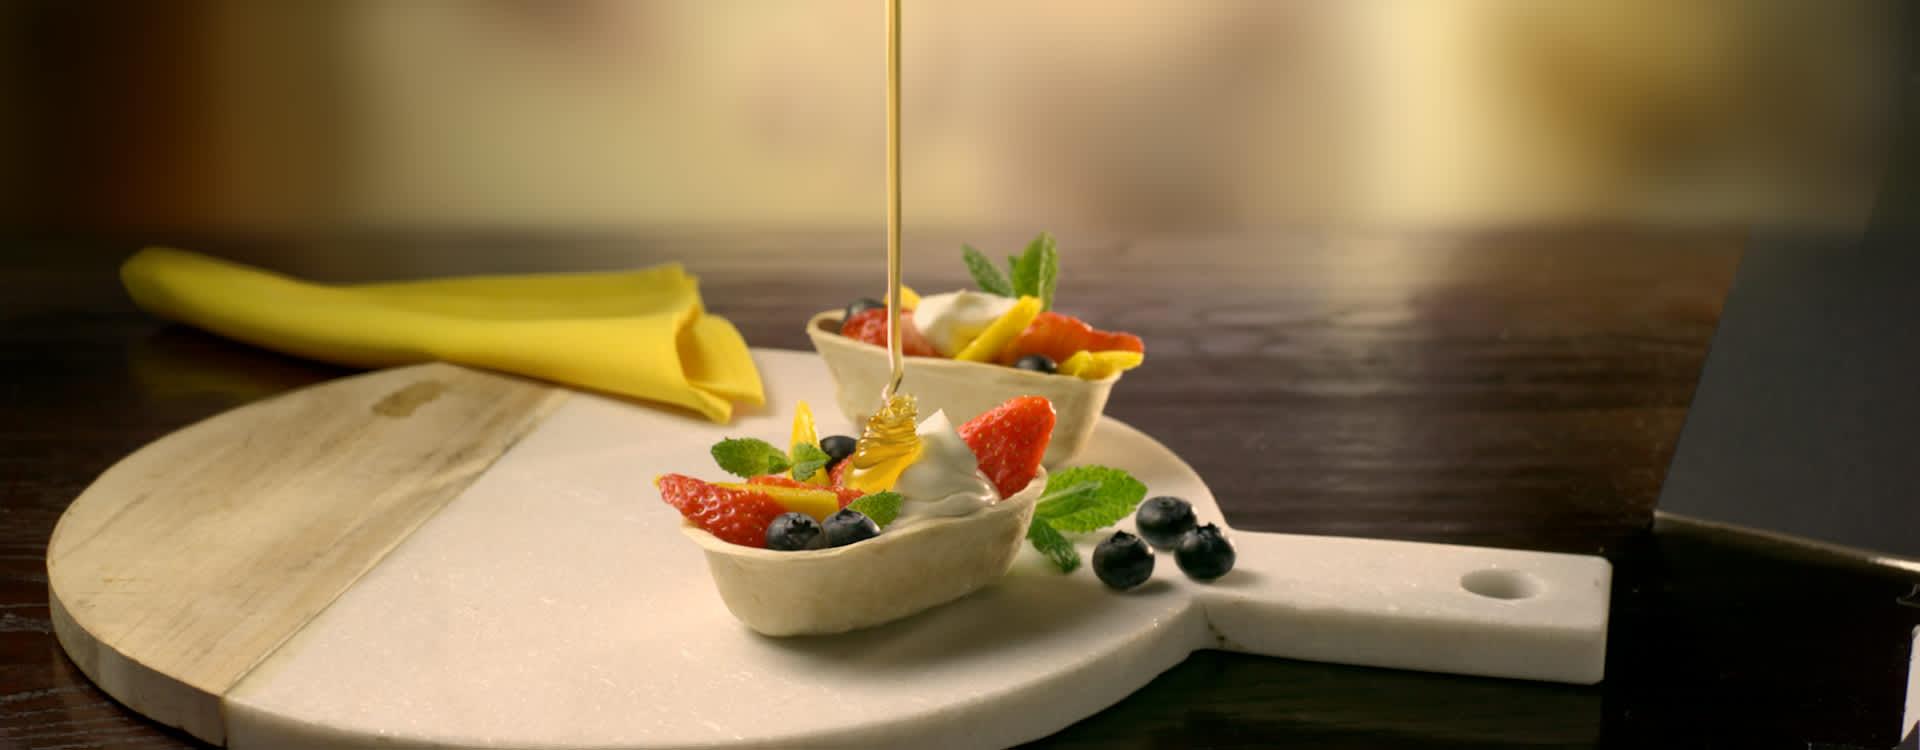 Mini Stand'N Stuff™ Taco med frukt